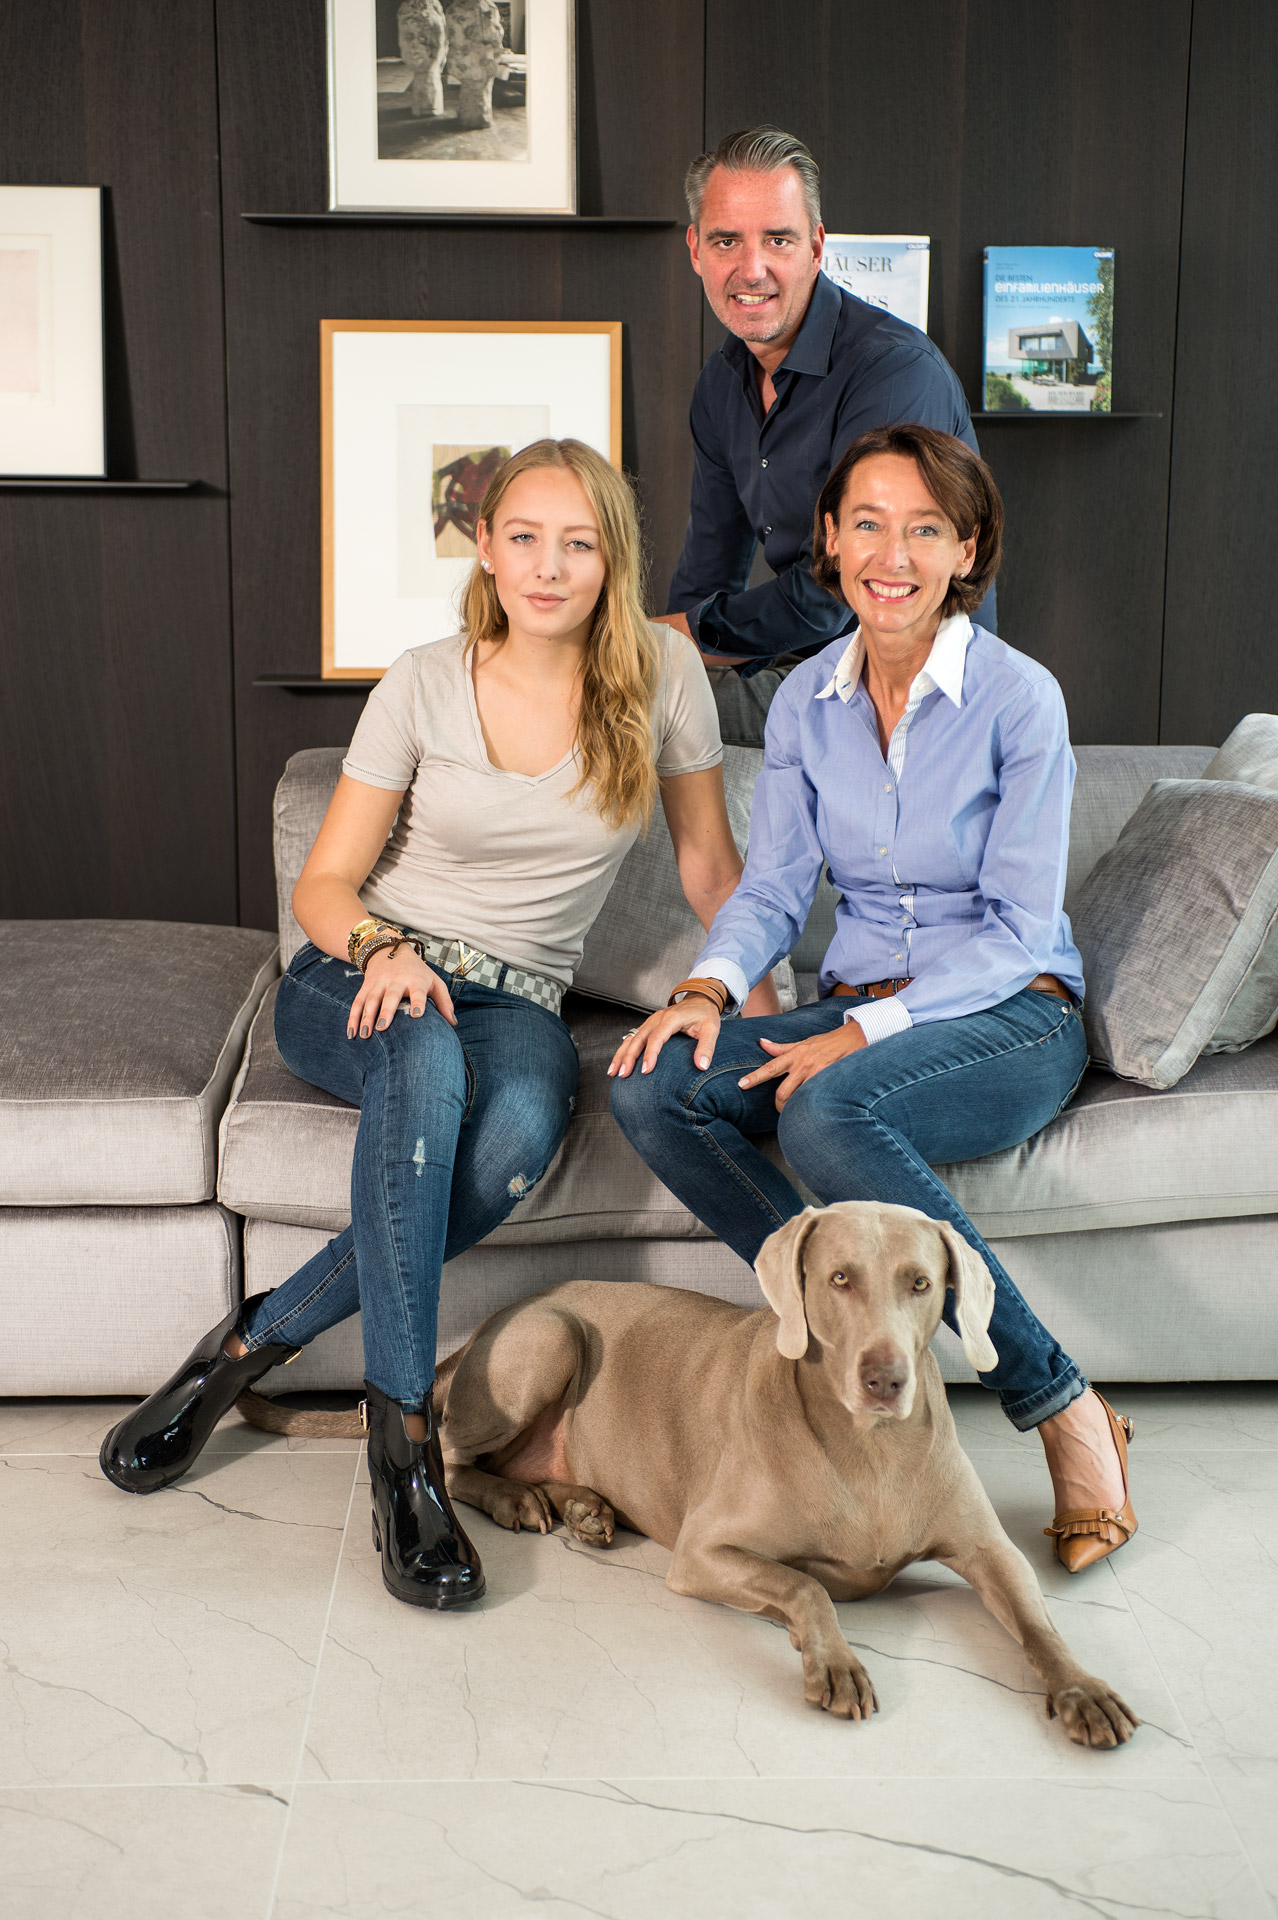 Familie Carsten Bünck, Foto: Dr. Klaus Schörner / Stilpunkte